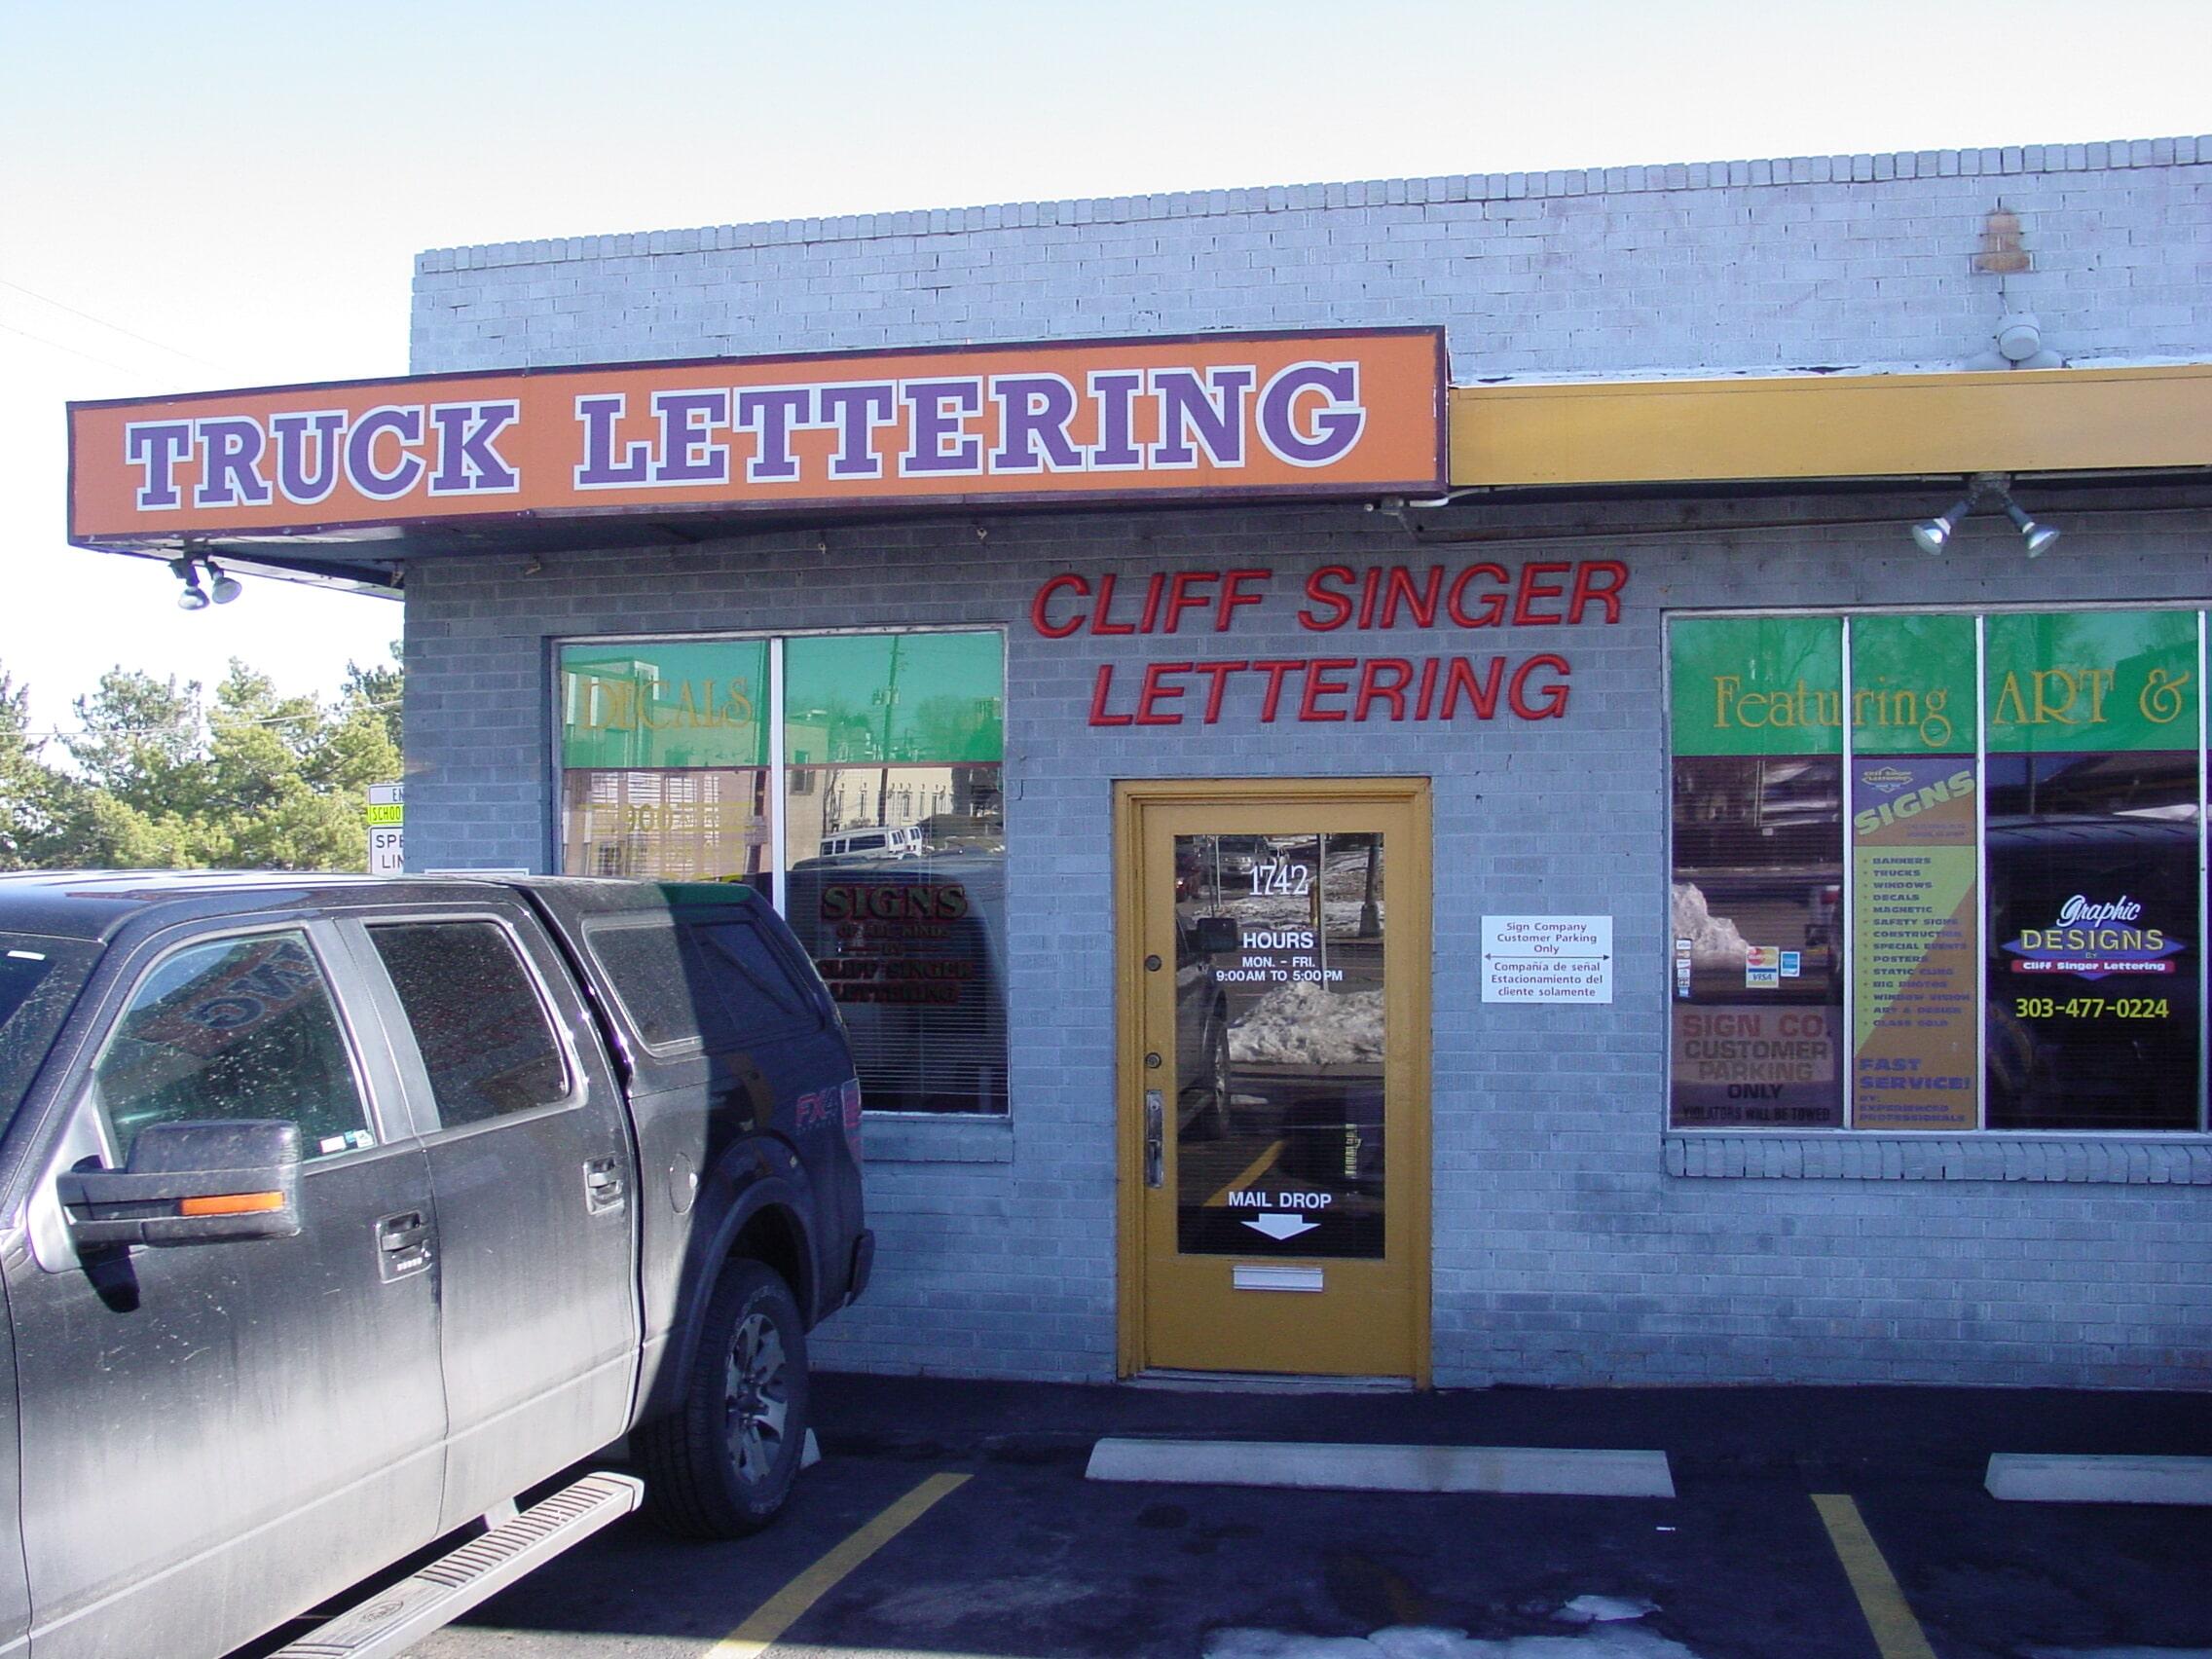 Cliff Singer Lettering Inc. image 1